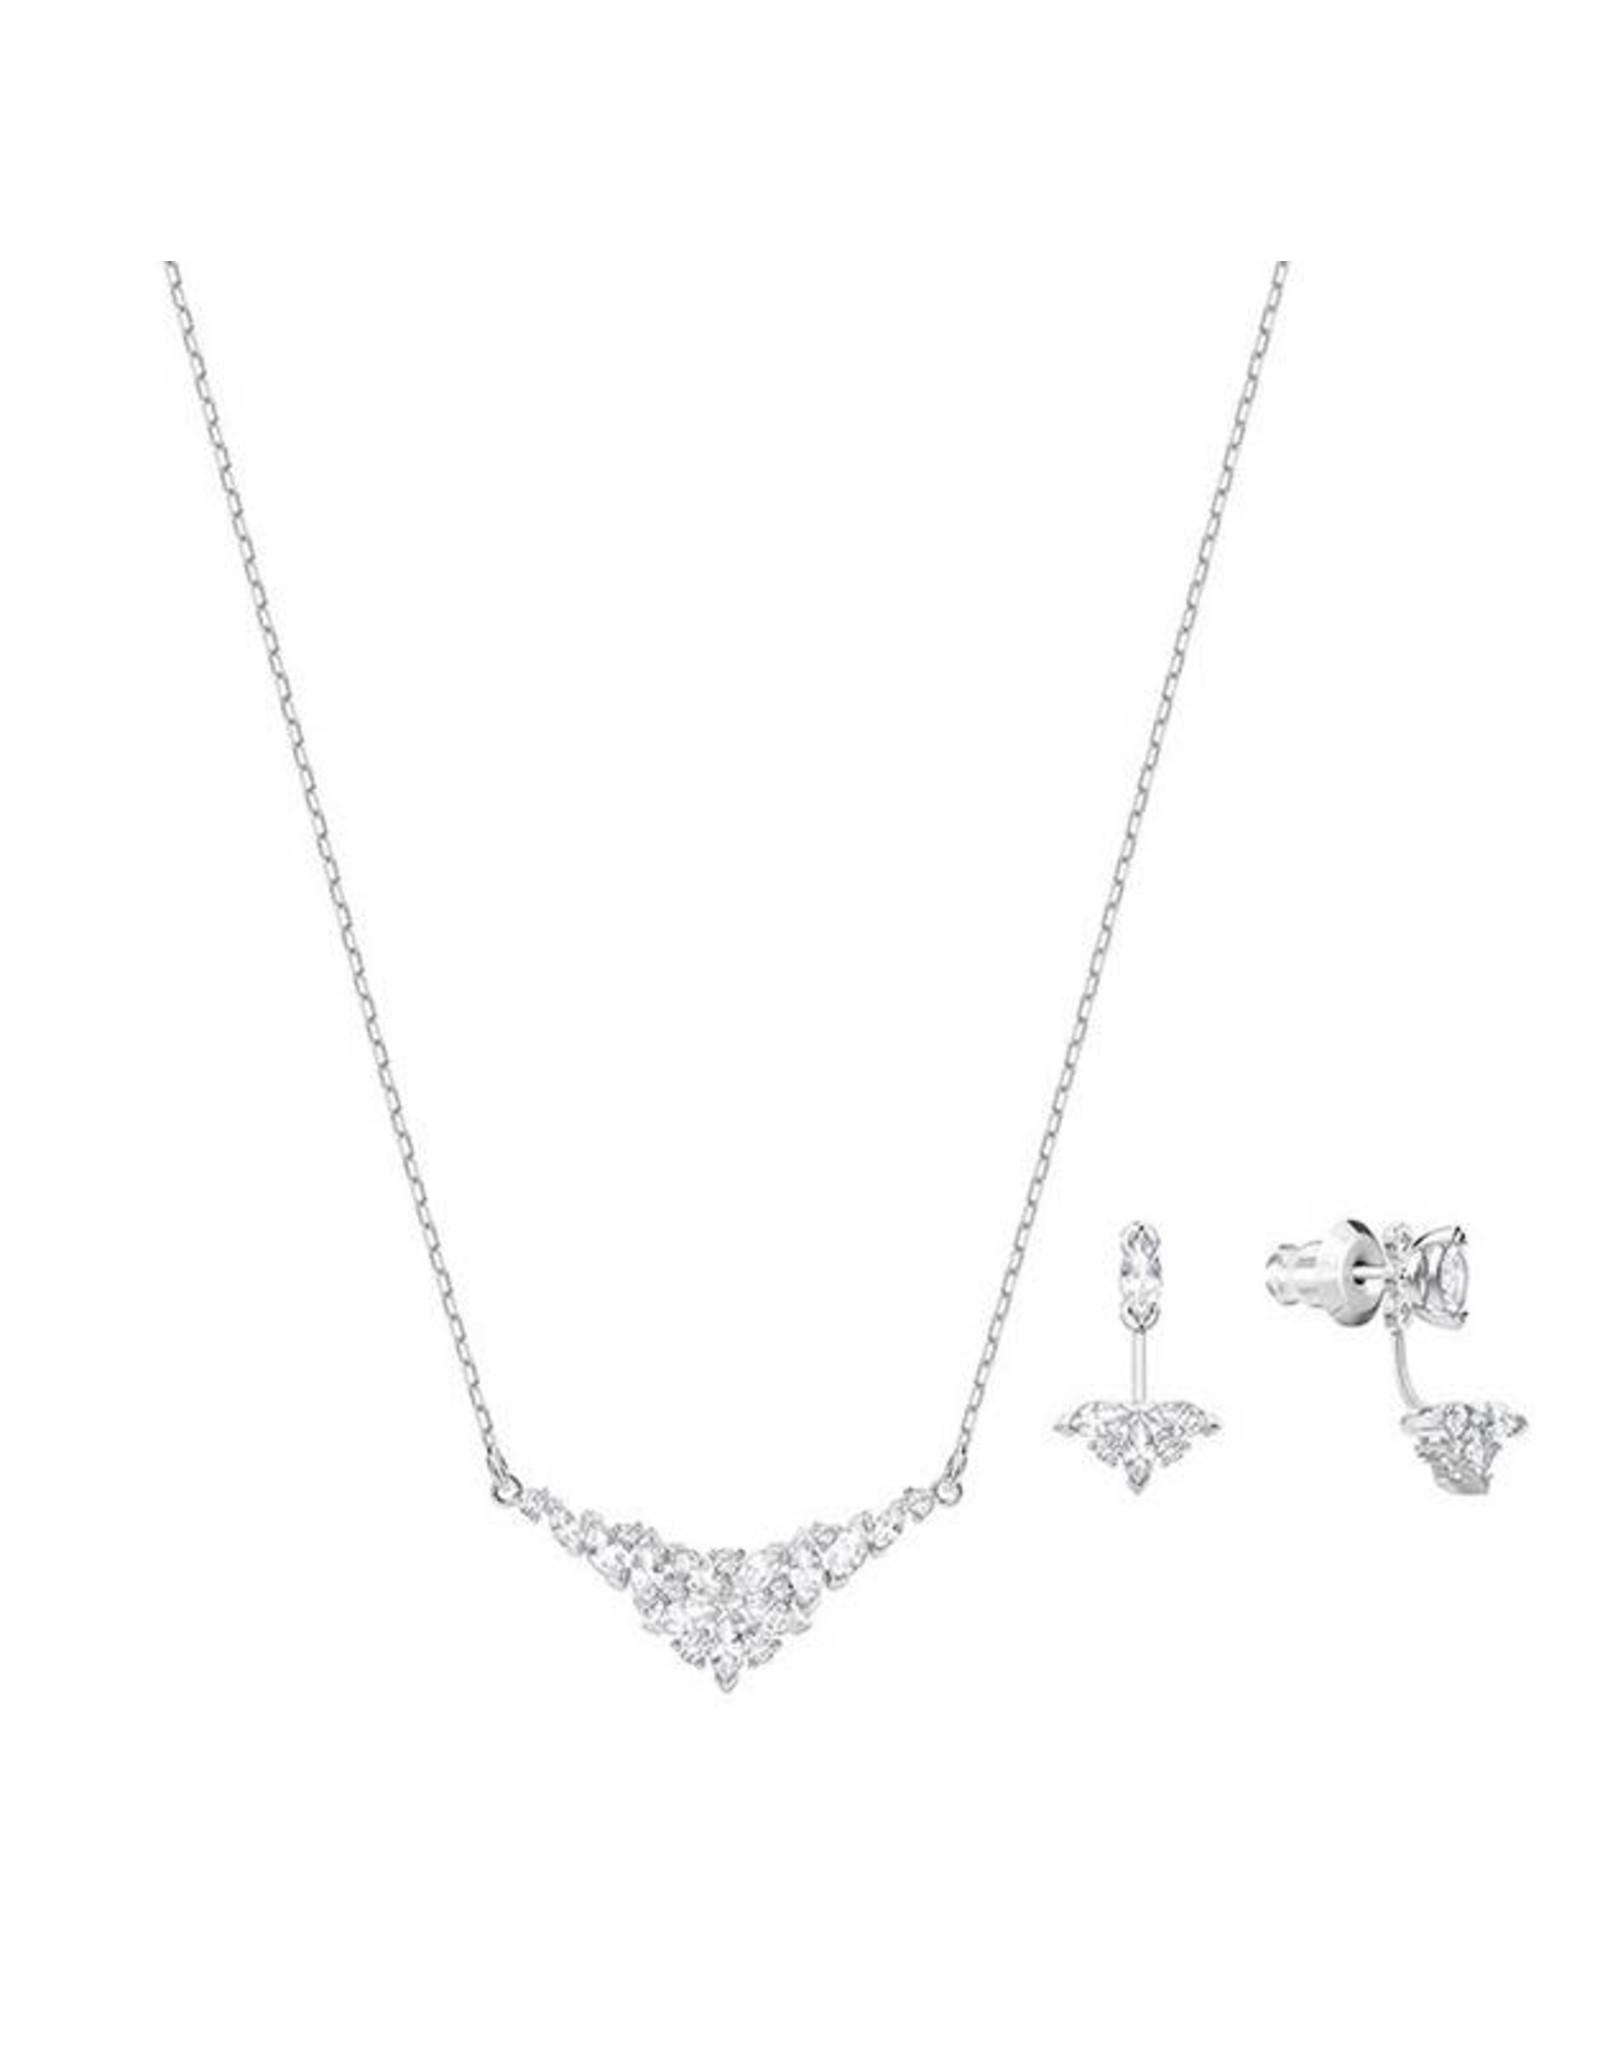 Swarovski Swarovski Lady Necklace & Earrings Set